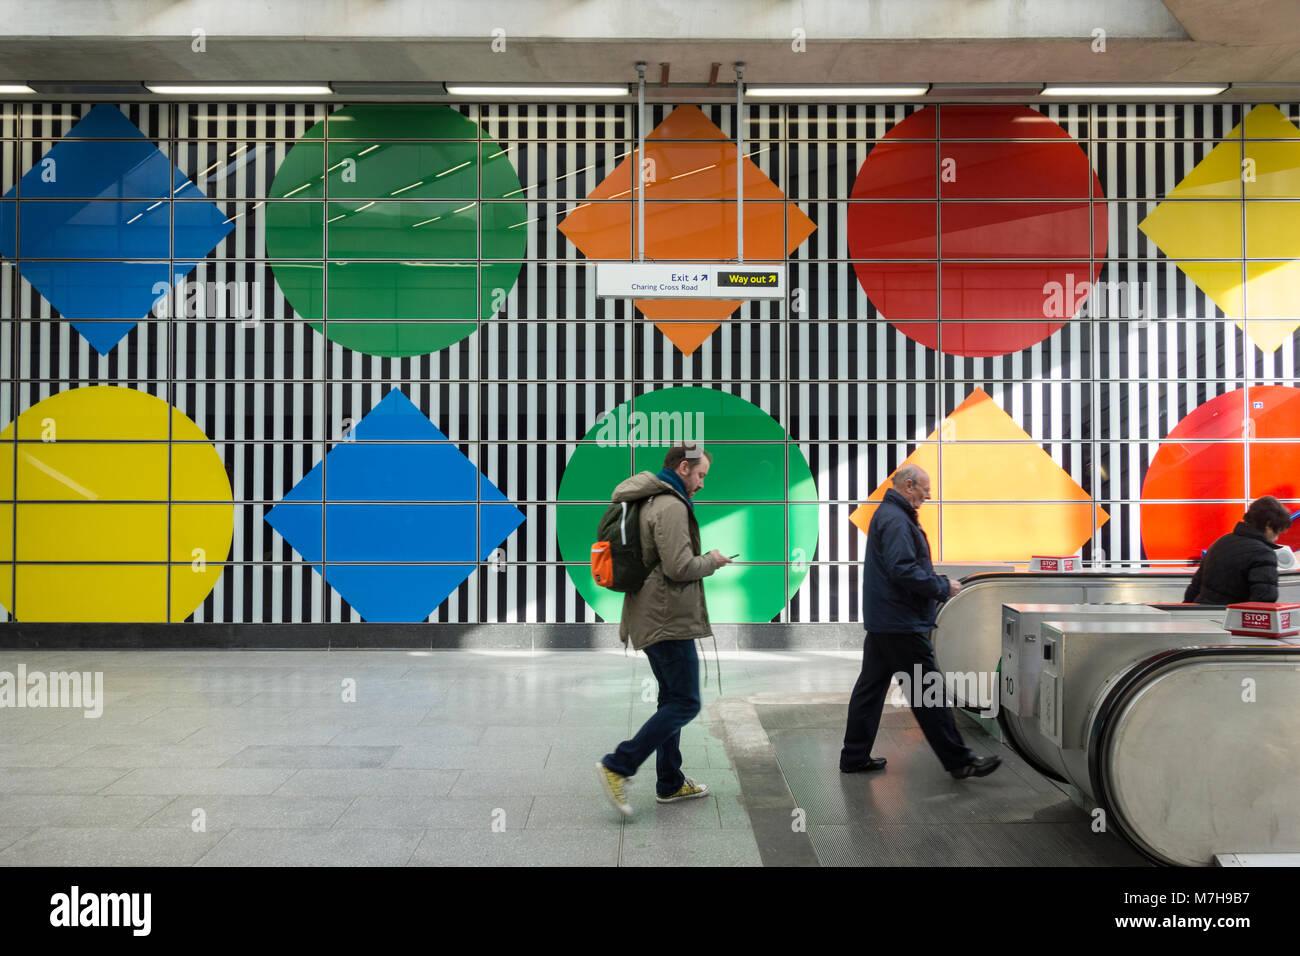 Daniel Buren S Wide Stripes And Geometric Patterns At Tottenham Court Stock Photo Alamy